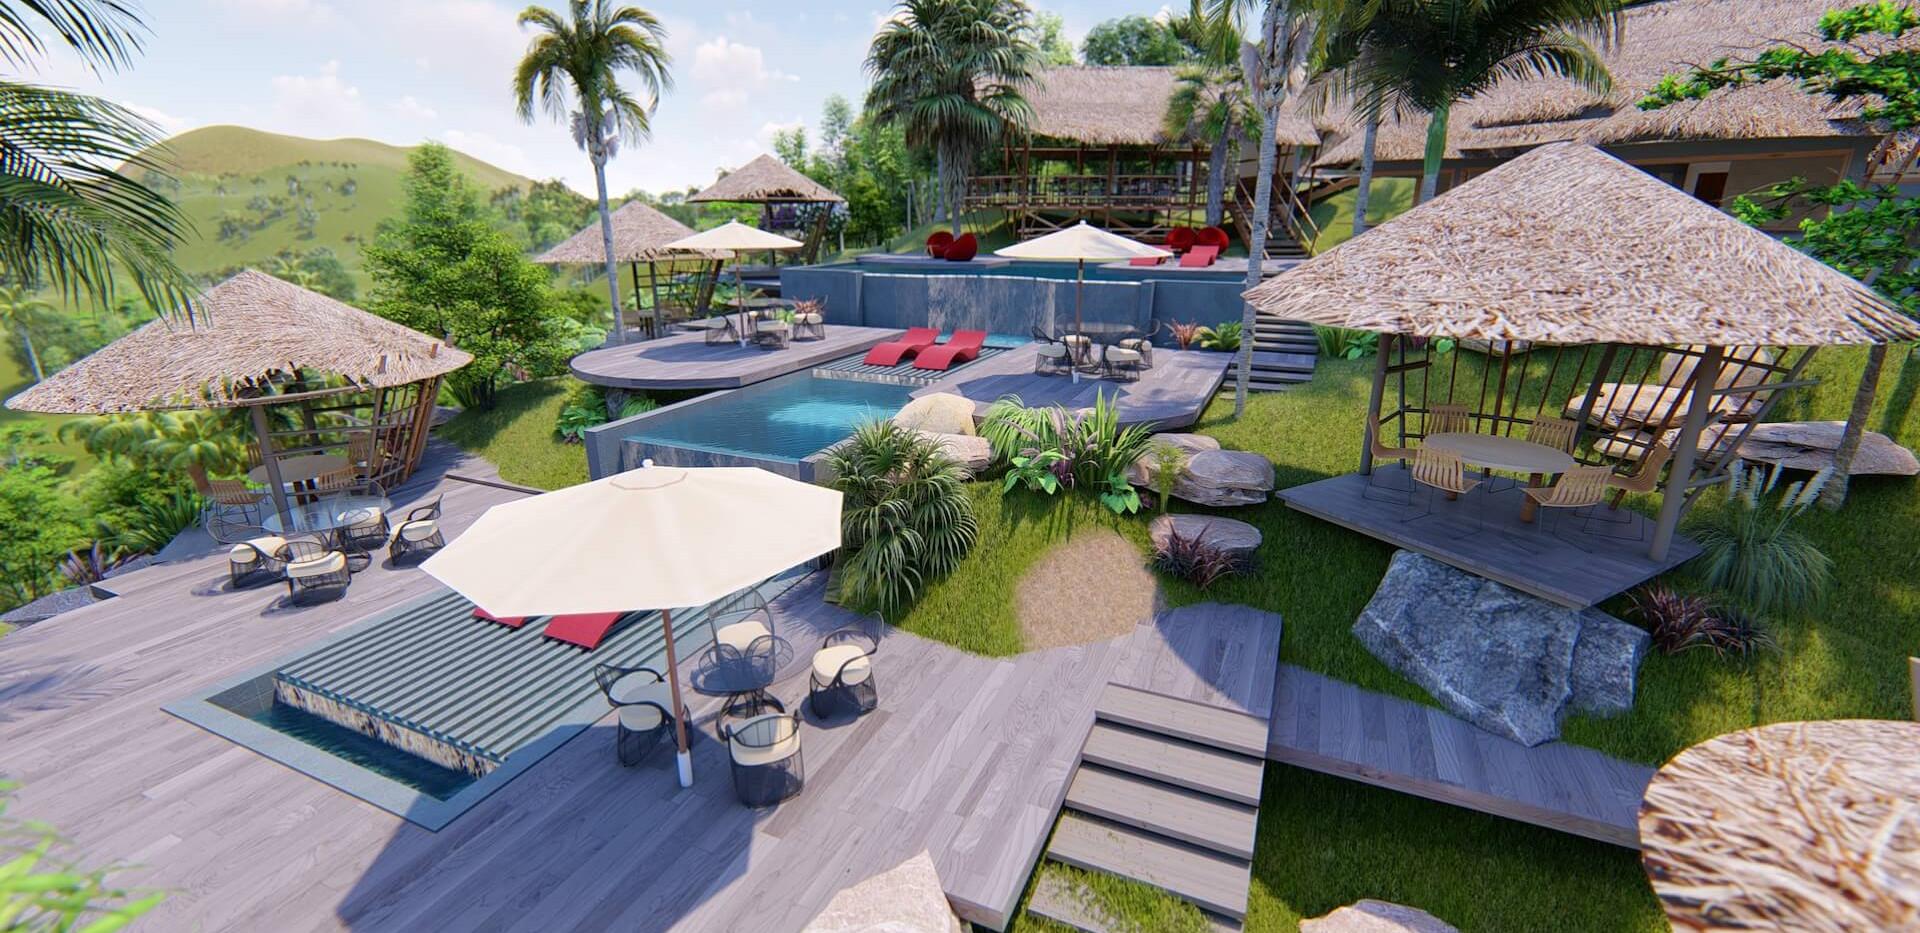 Restaurant le balcon - Panoramic.jpg